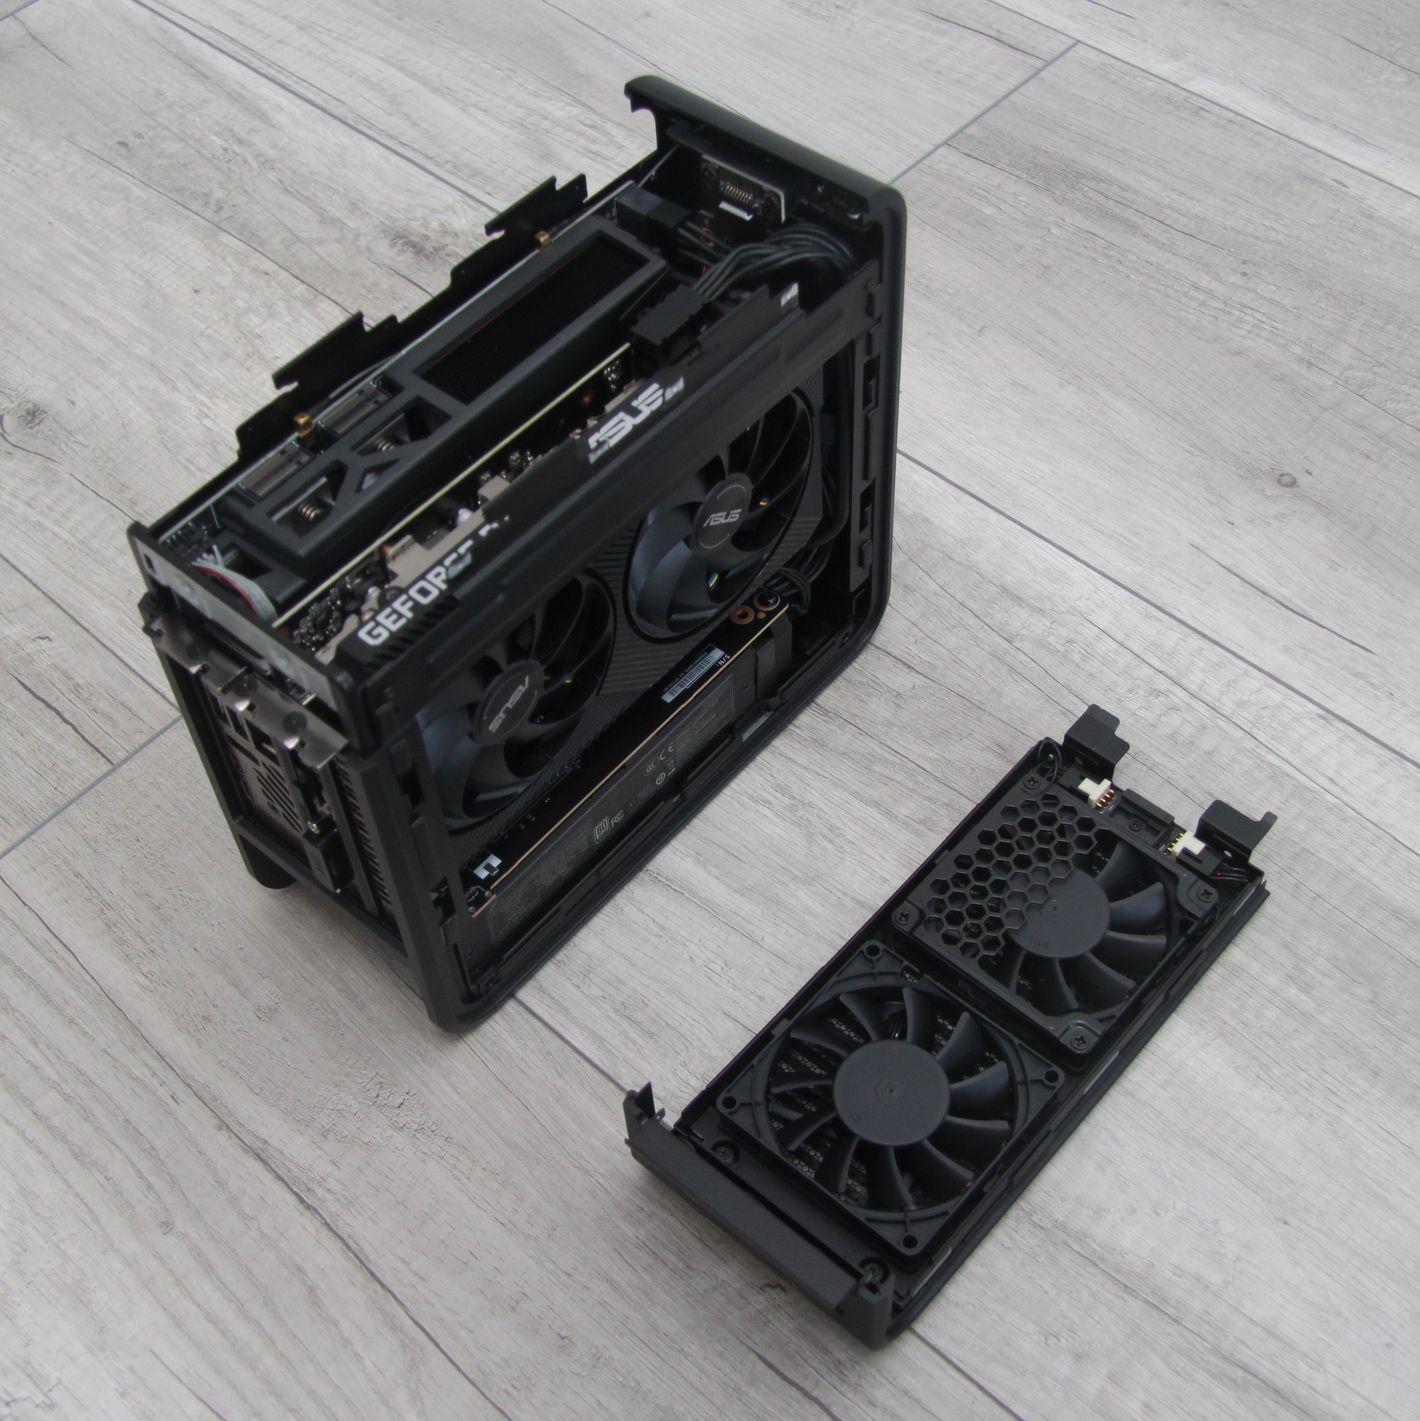 Intel NUC 9 Extreme wnętrze